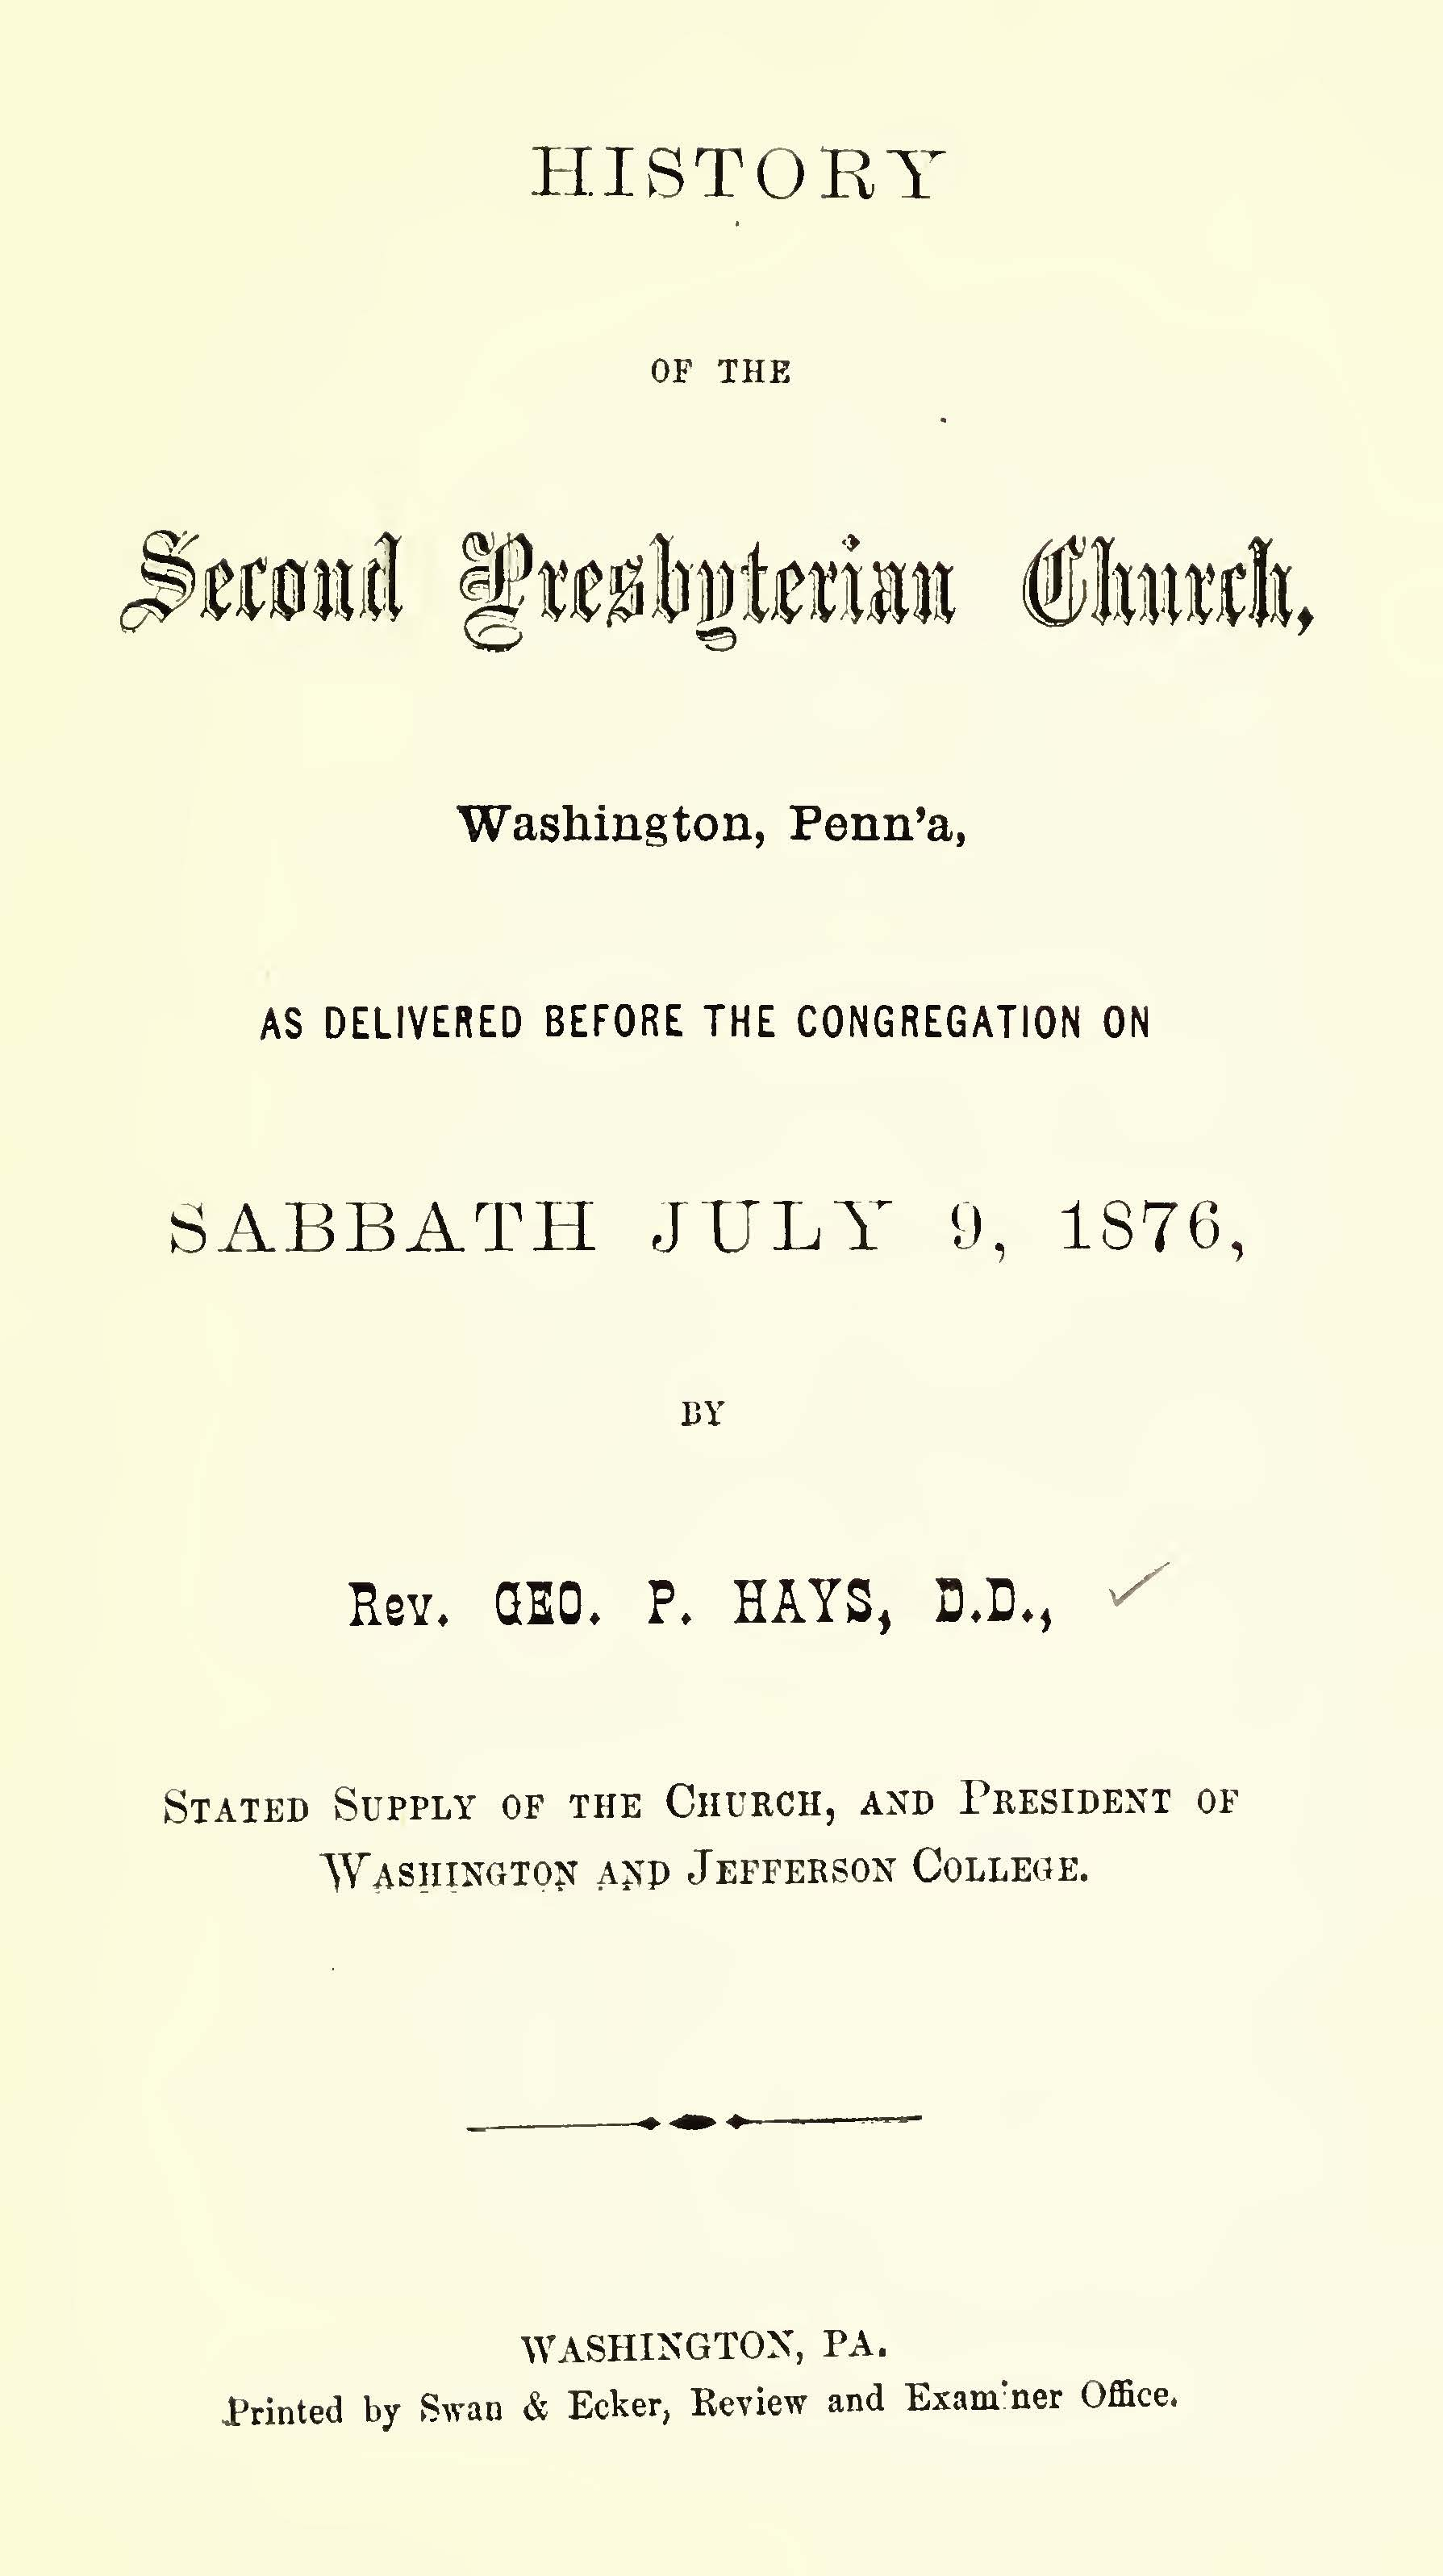 Hays, George Price, History of the Second Presbyterian Church Washington Penna Title Page.jpg